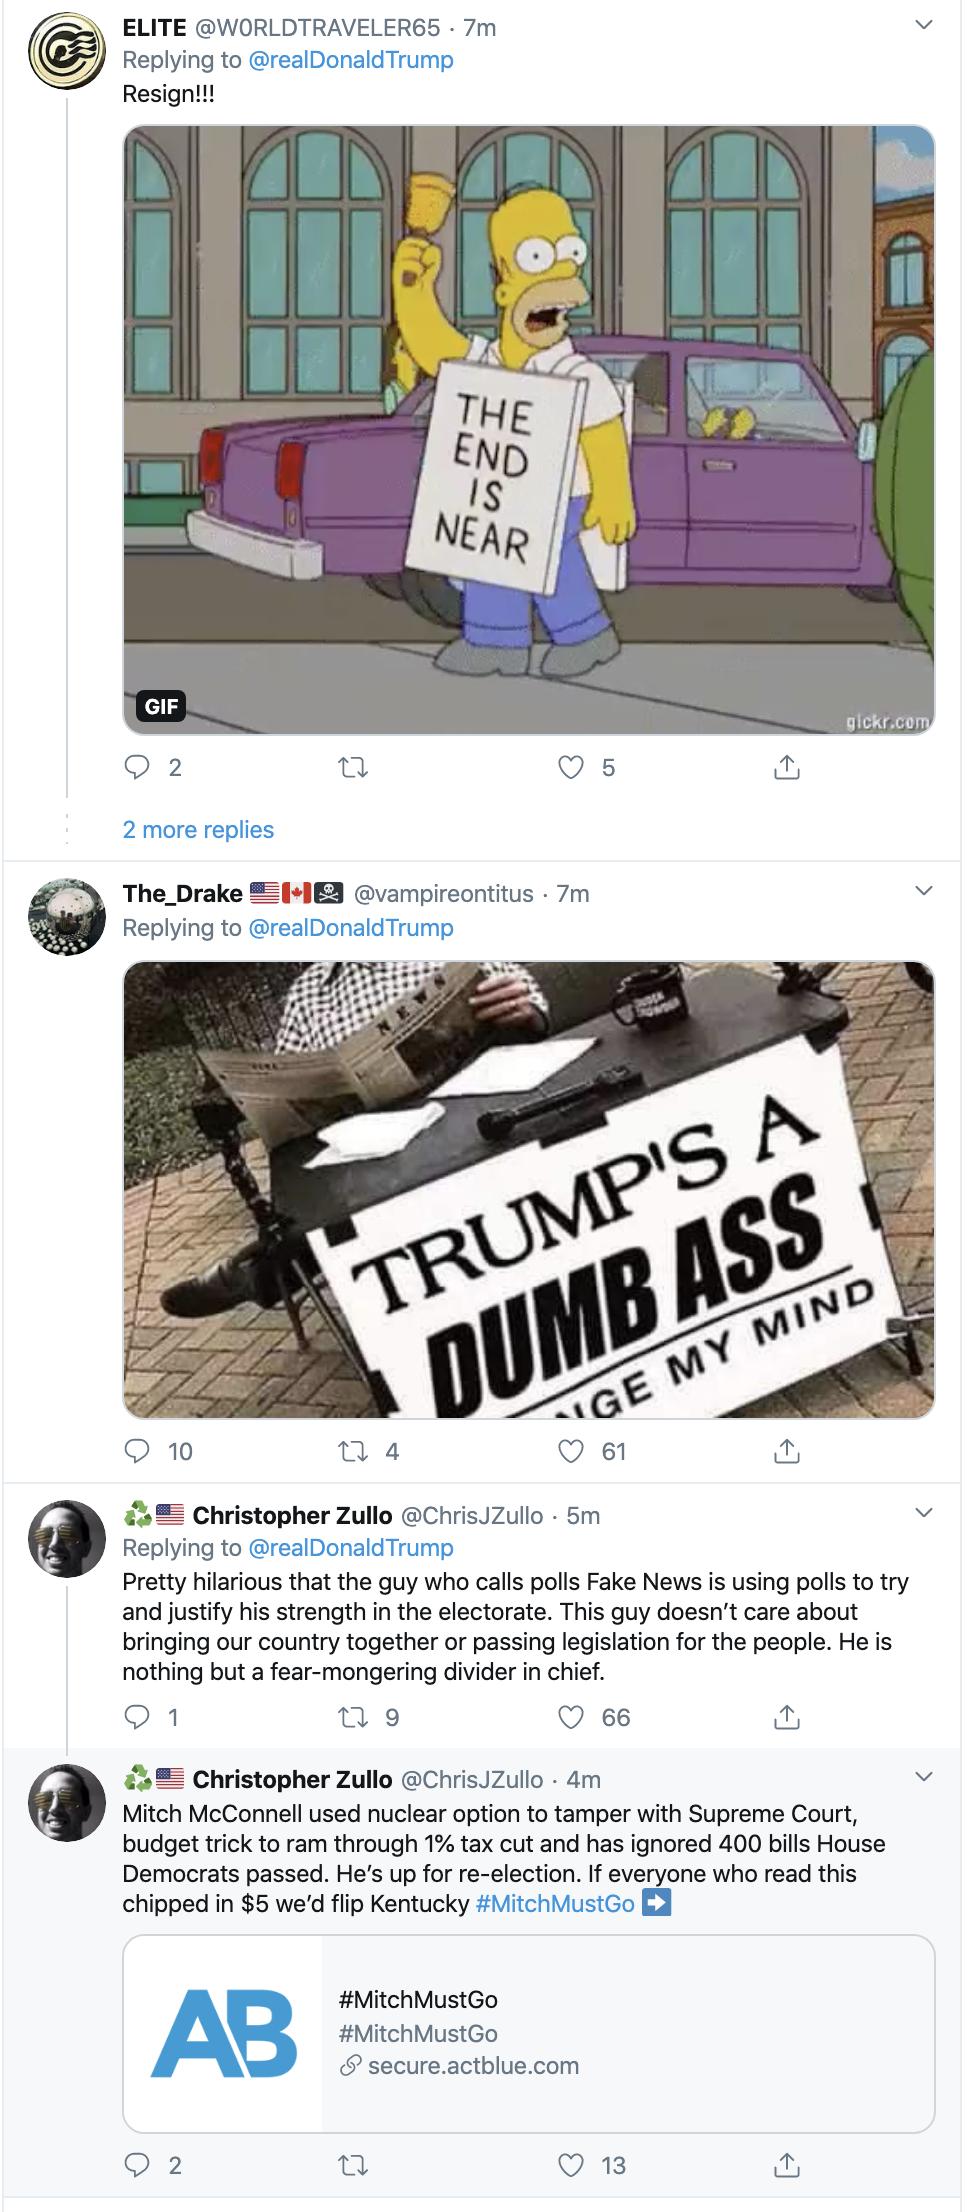 Screen-Shot-2020-02-09-at-8.42.34-AM Trump Suffers Sunday Morning Multi-Tweet Mental Collapse Donald Trump Featured Mental Illness Politics Top Stories